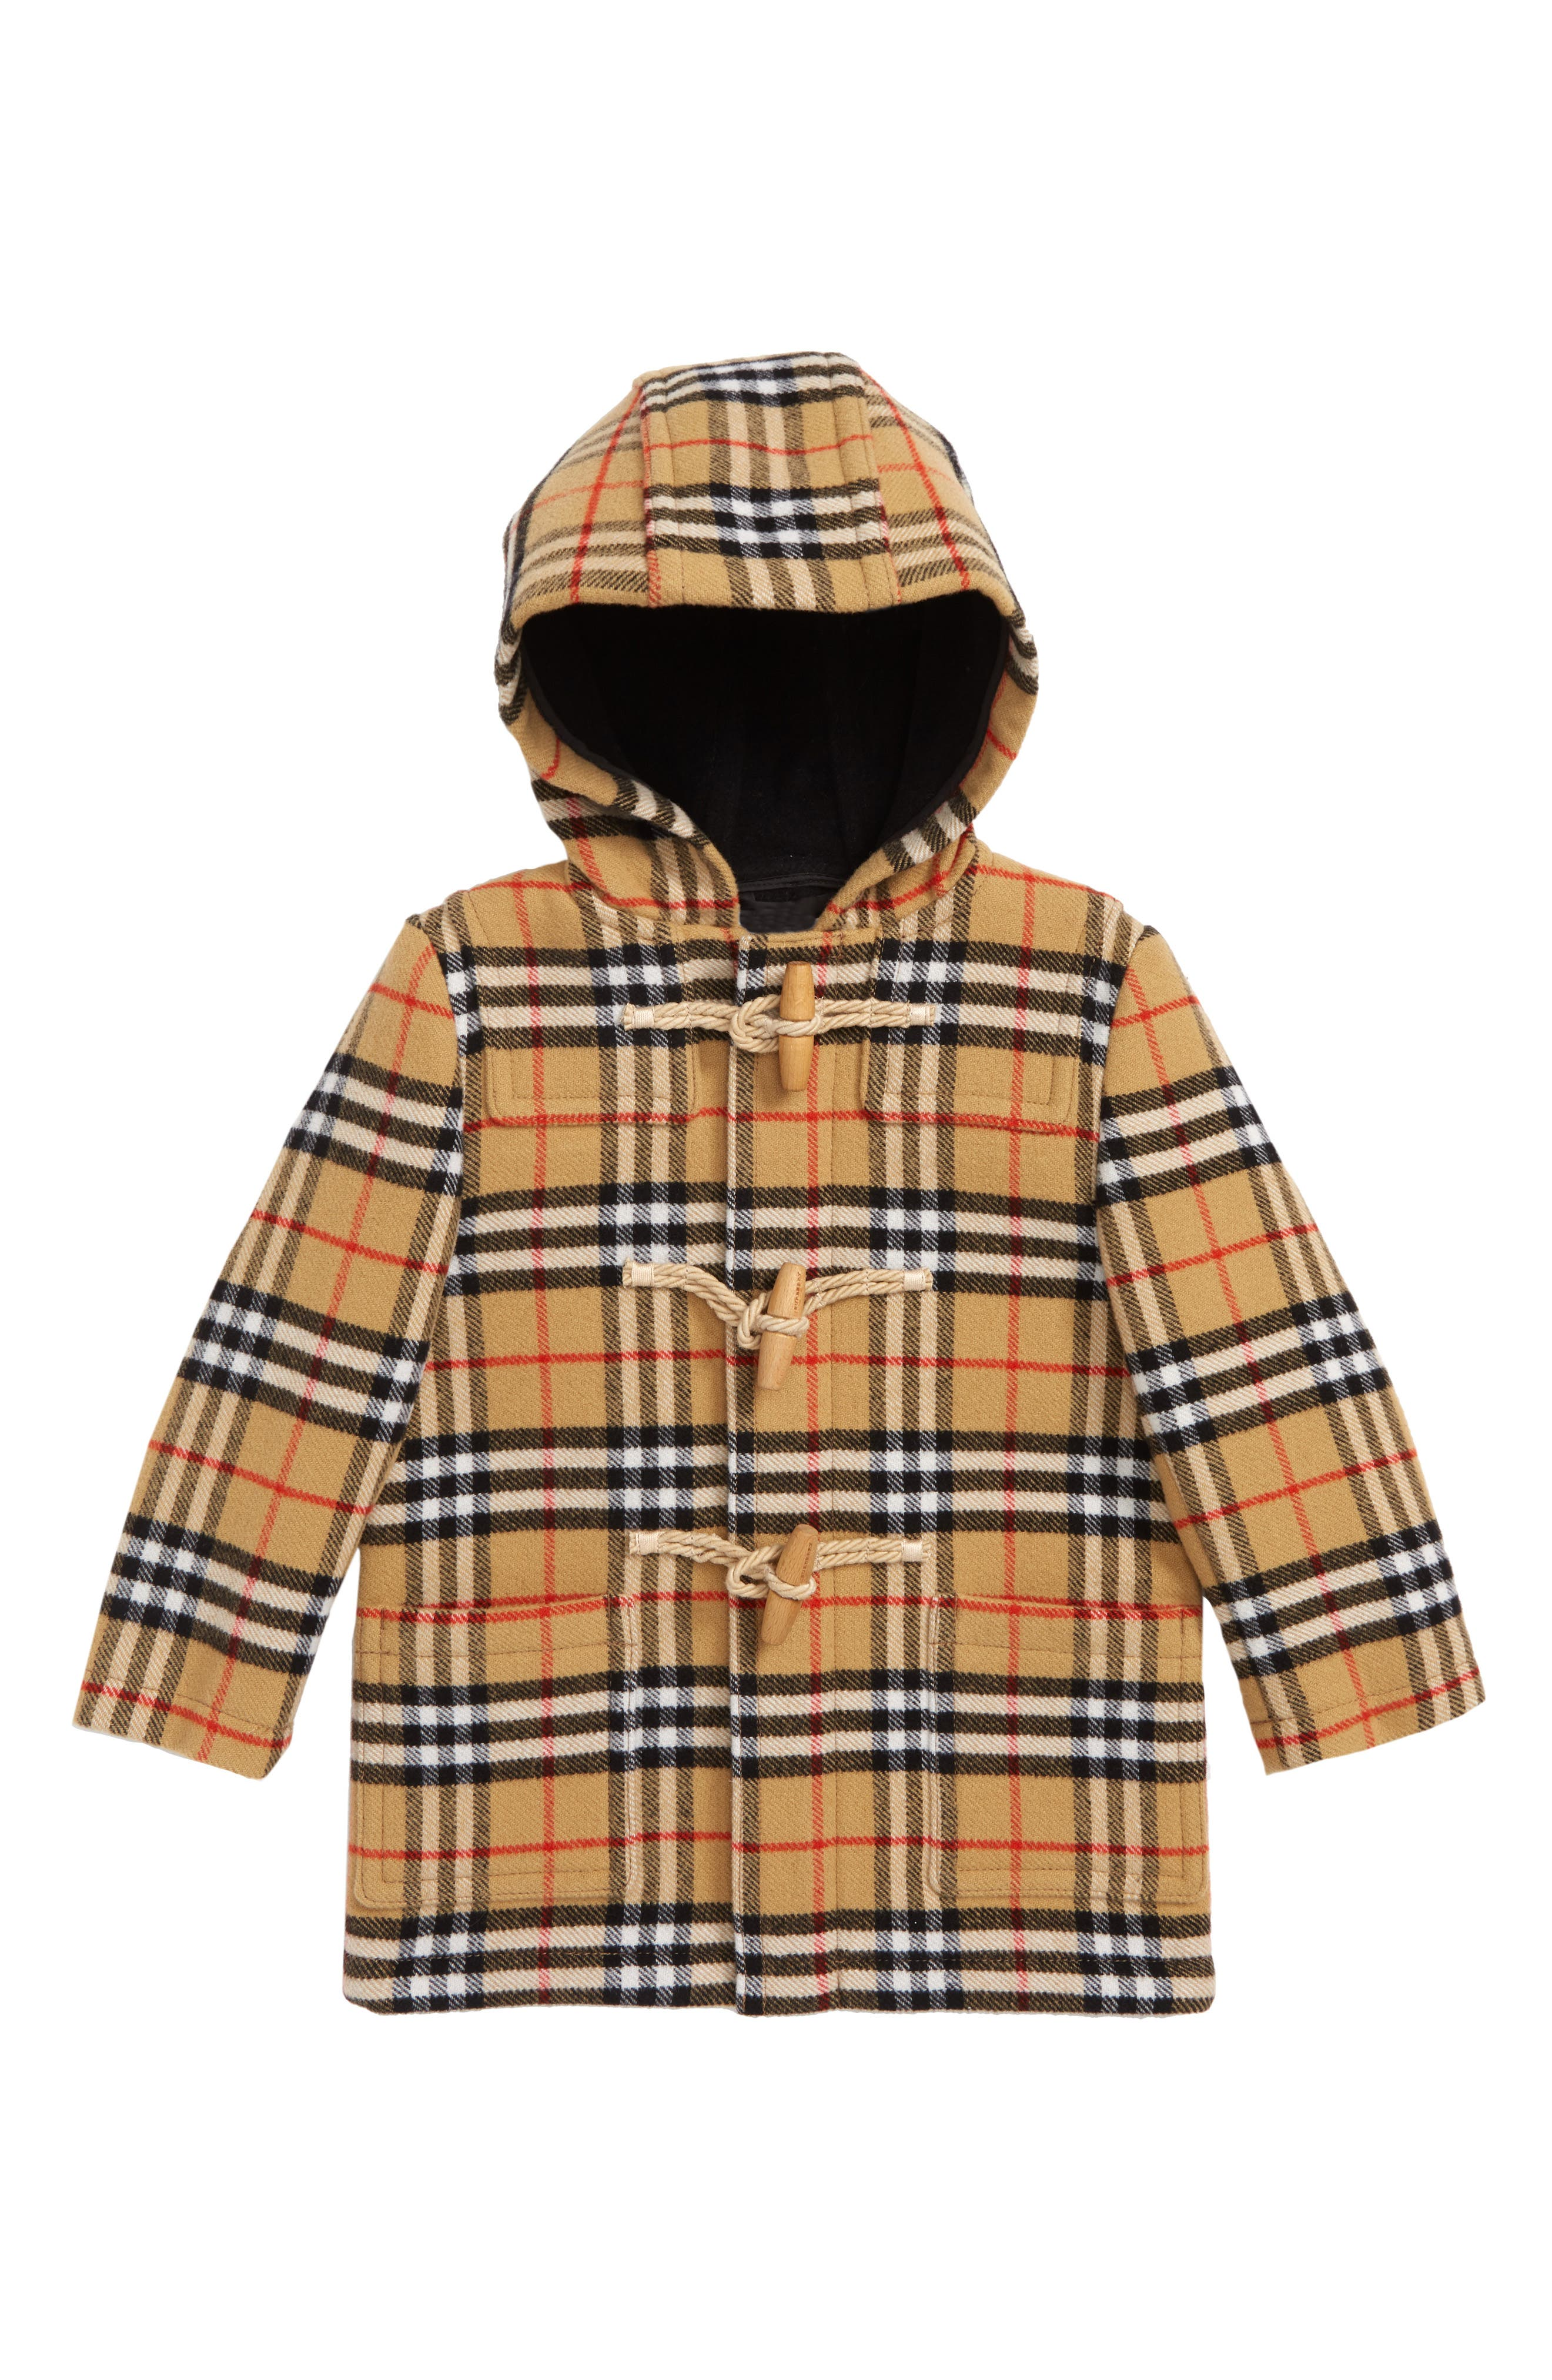 BURBERRY Brogan Hooded Wool Toggle Coat, Main, color, 001